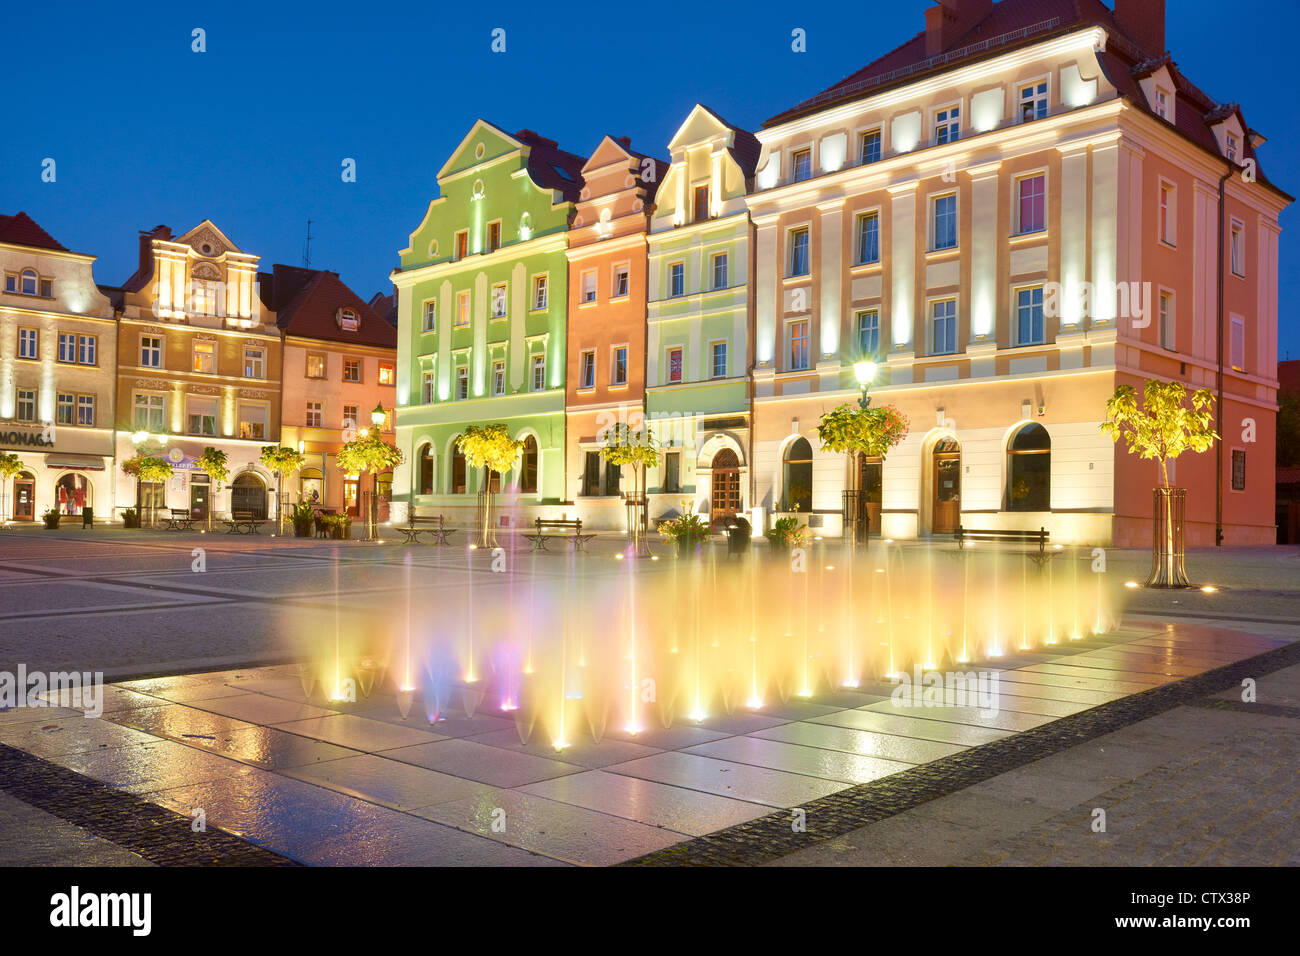 Boleslawiec, Lower Silesian Voivodeship in southwestern Poland, Poland, Europe - Stock Image